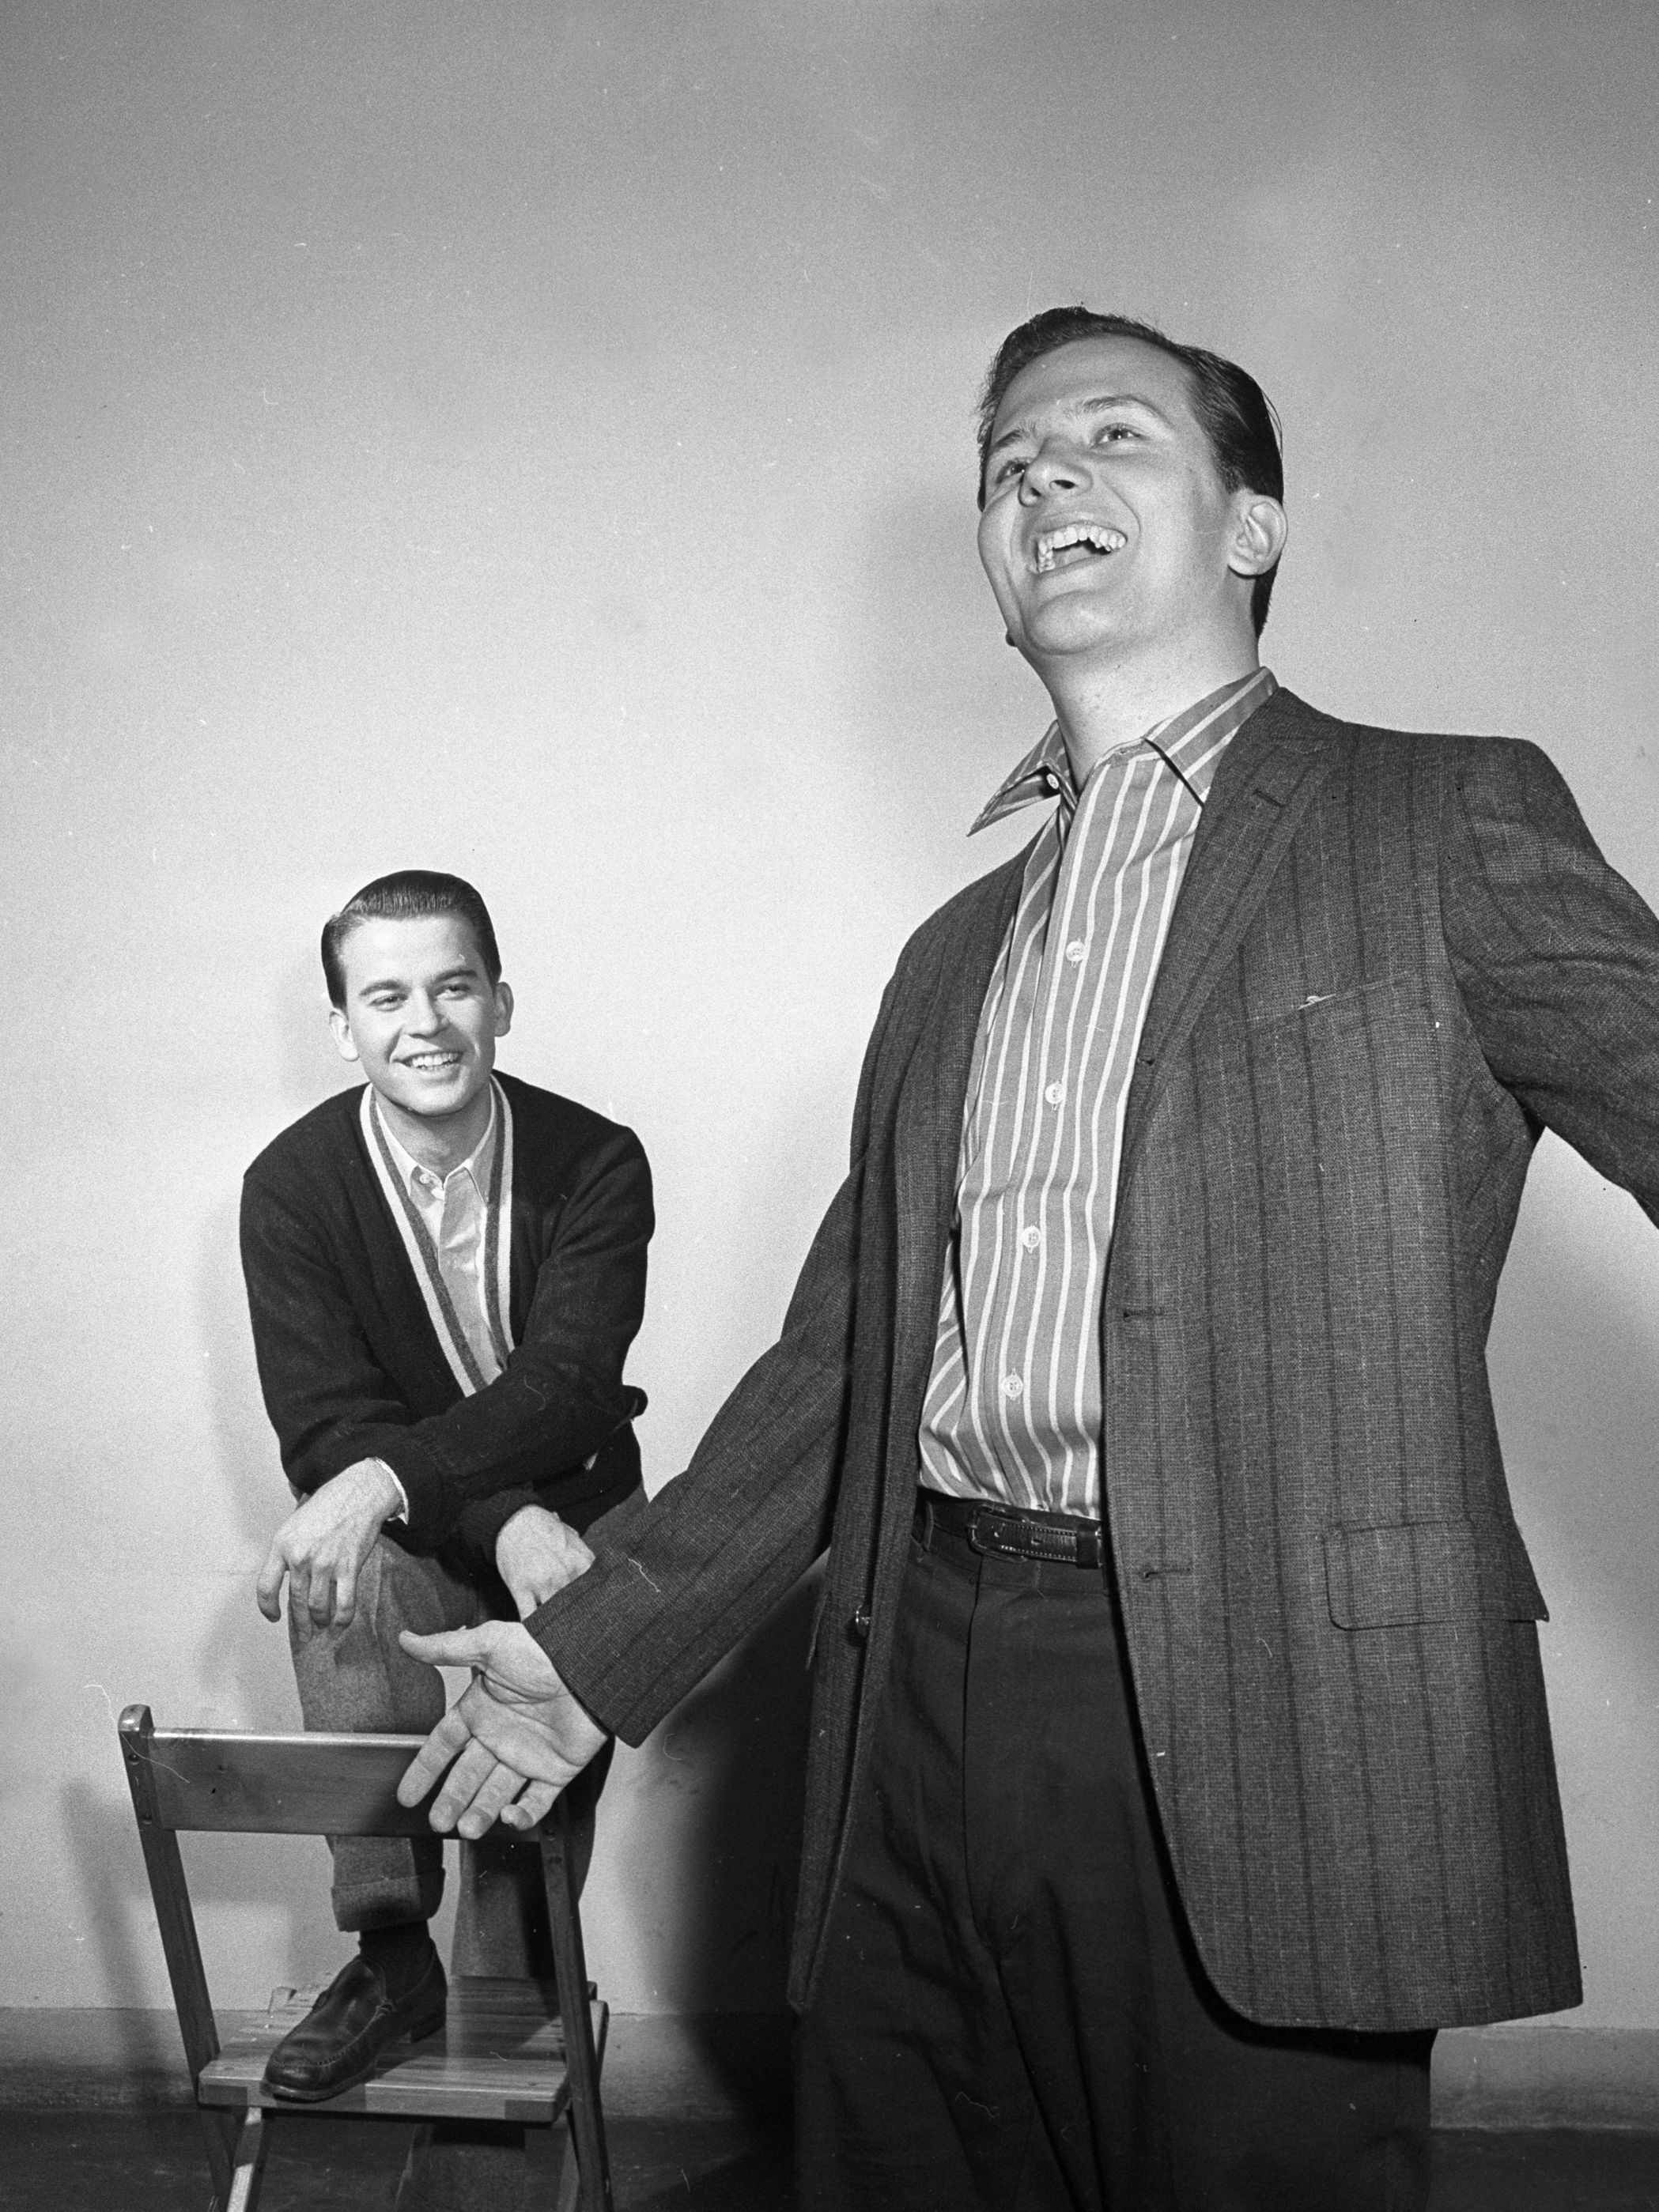 Clark and Pat Boone circa 1958